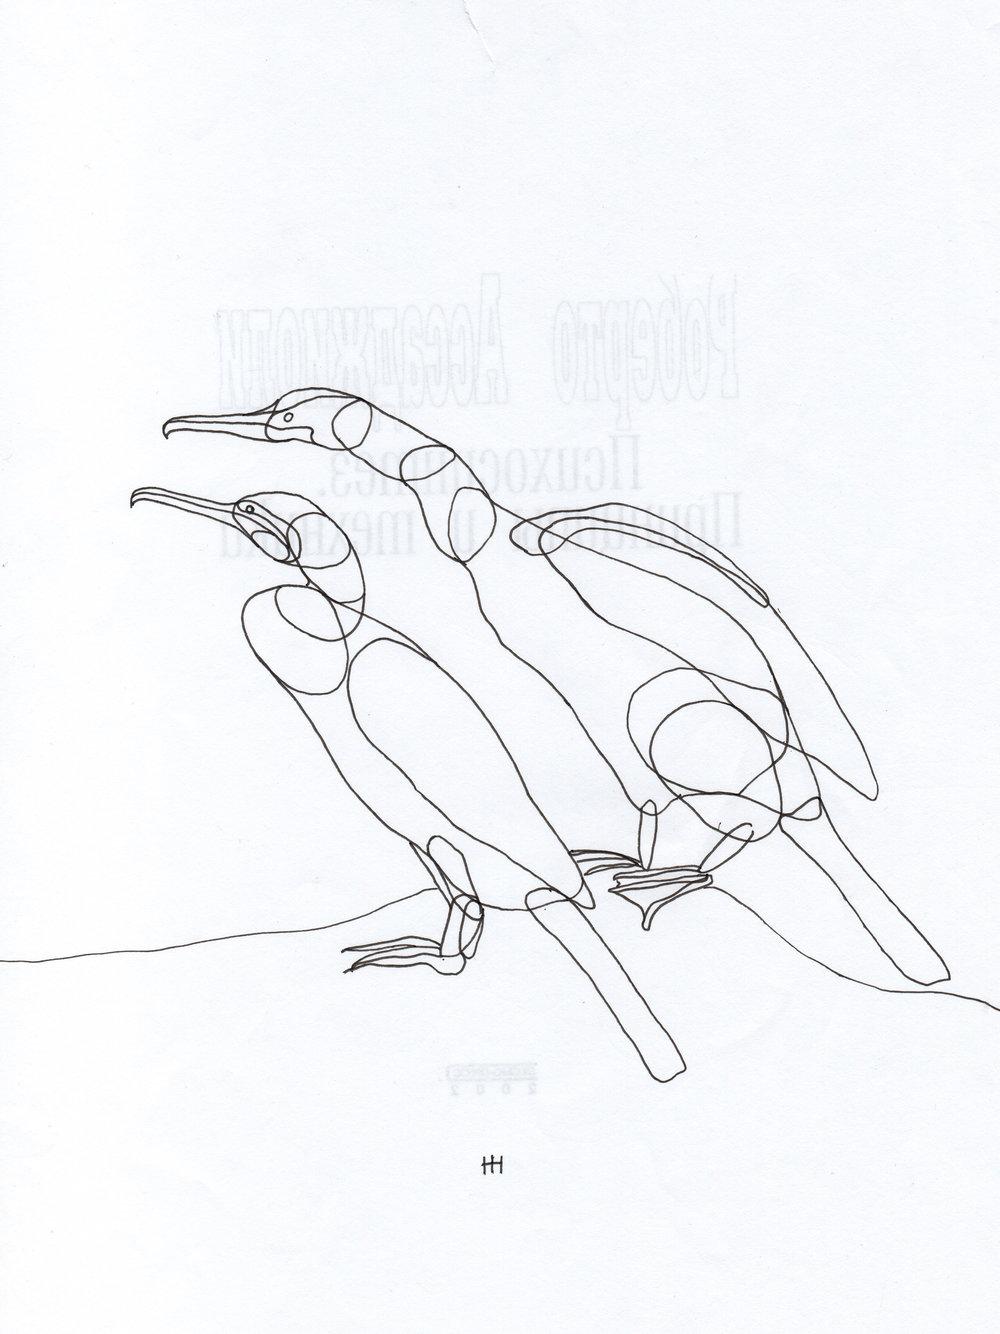 PticyLinejnye_0 4.jpg